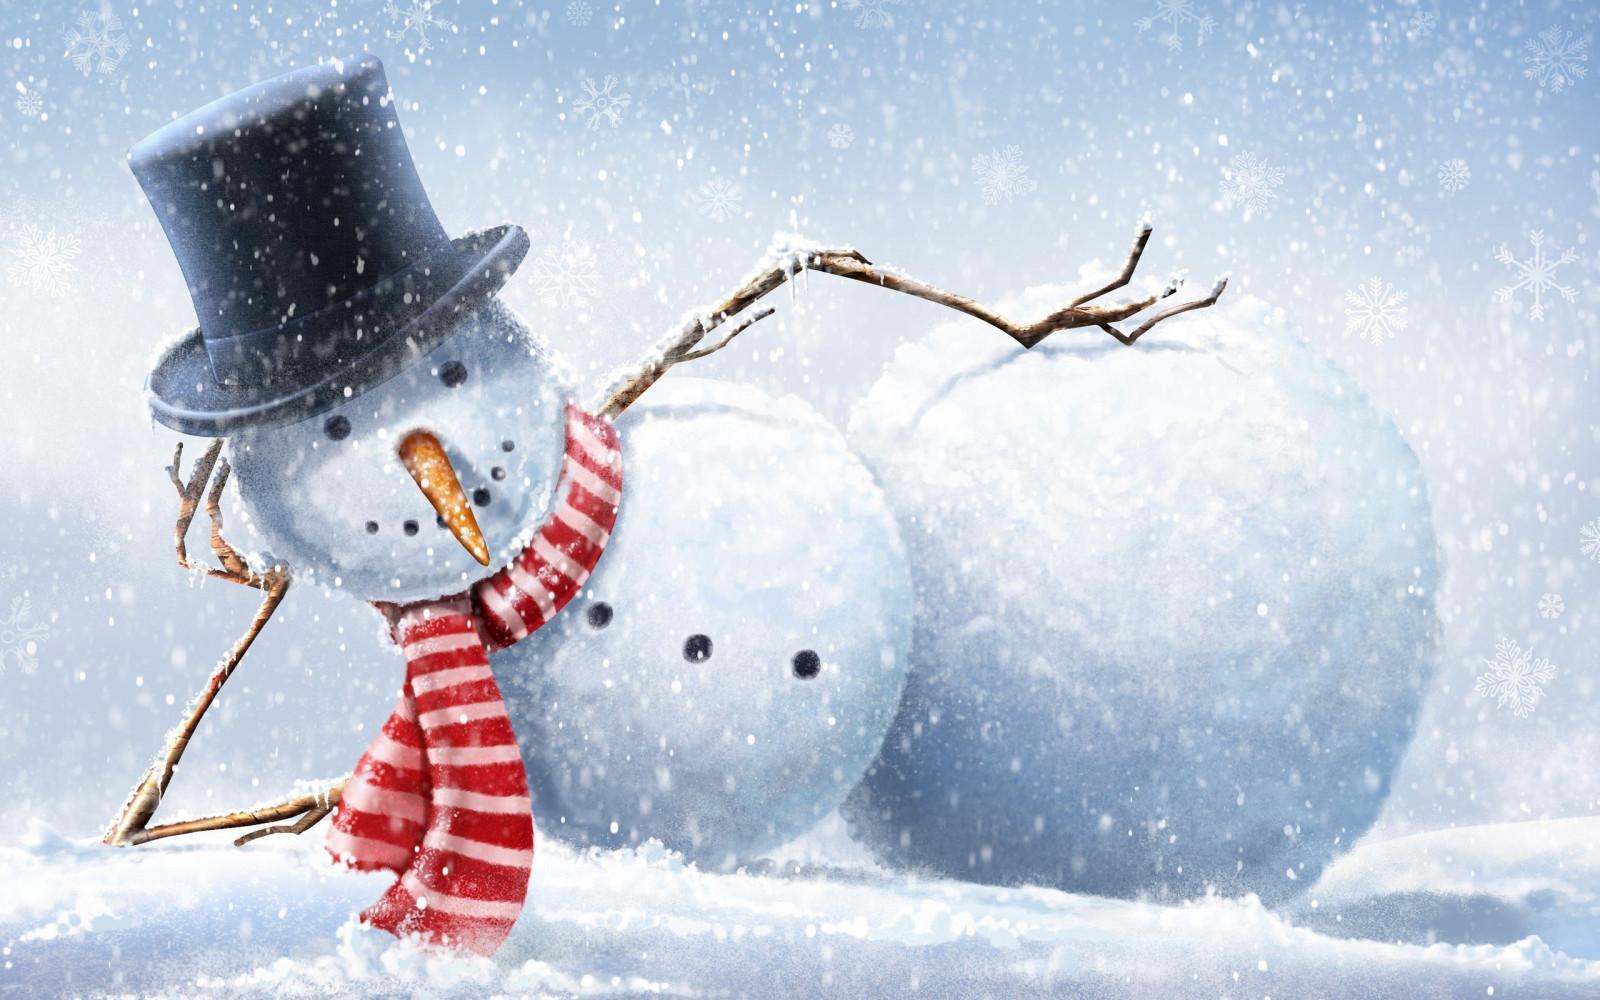 humor, snow, winter, snowman, Christmas, Arctic, New Year, Freezing, snowmen, weather, season